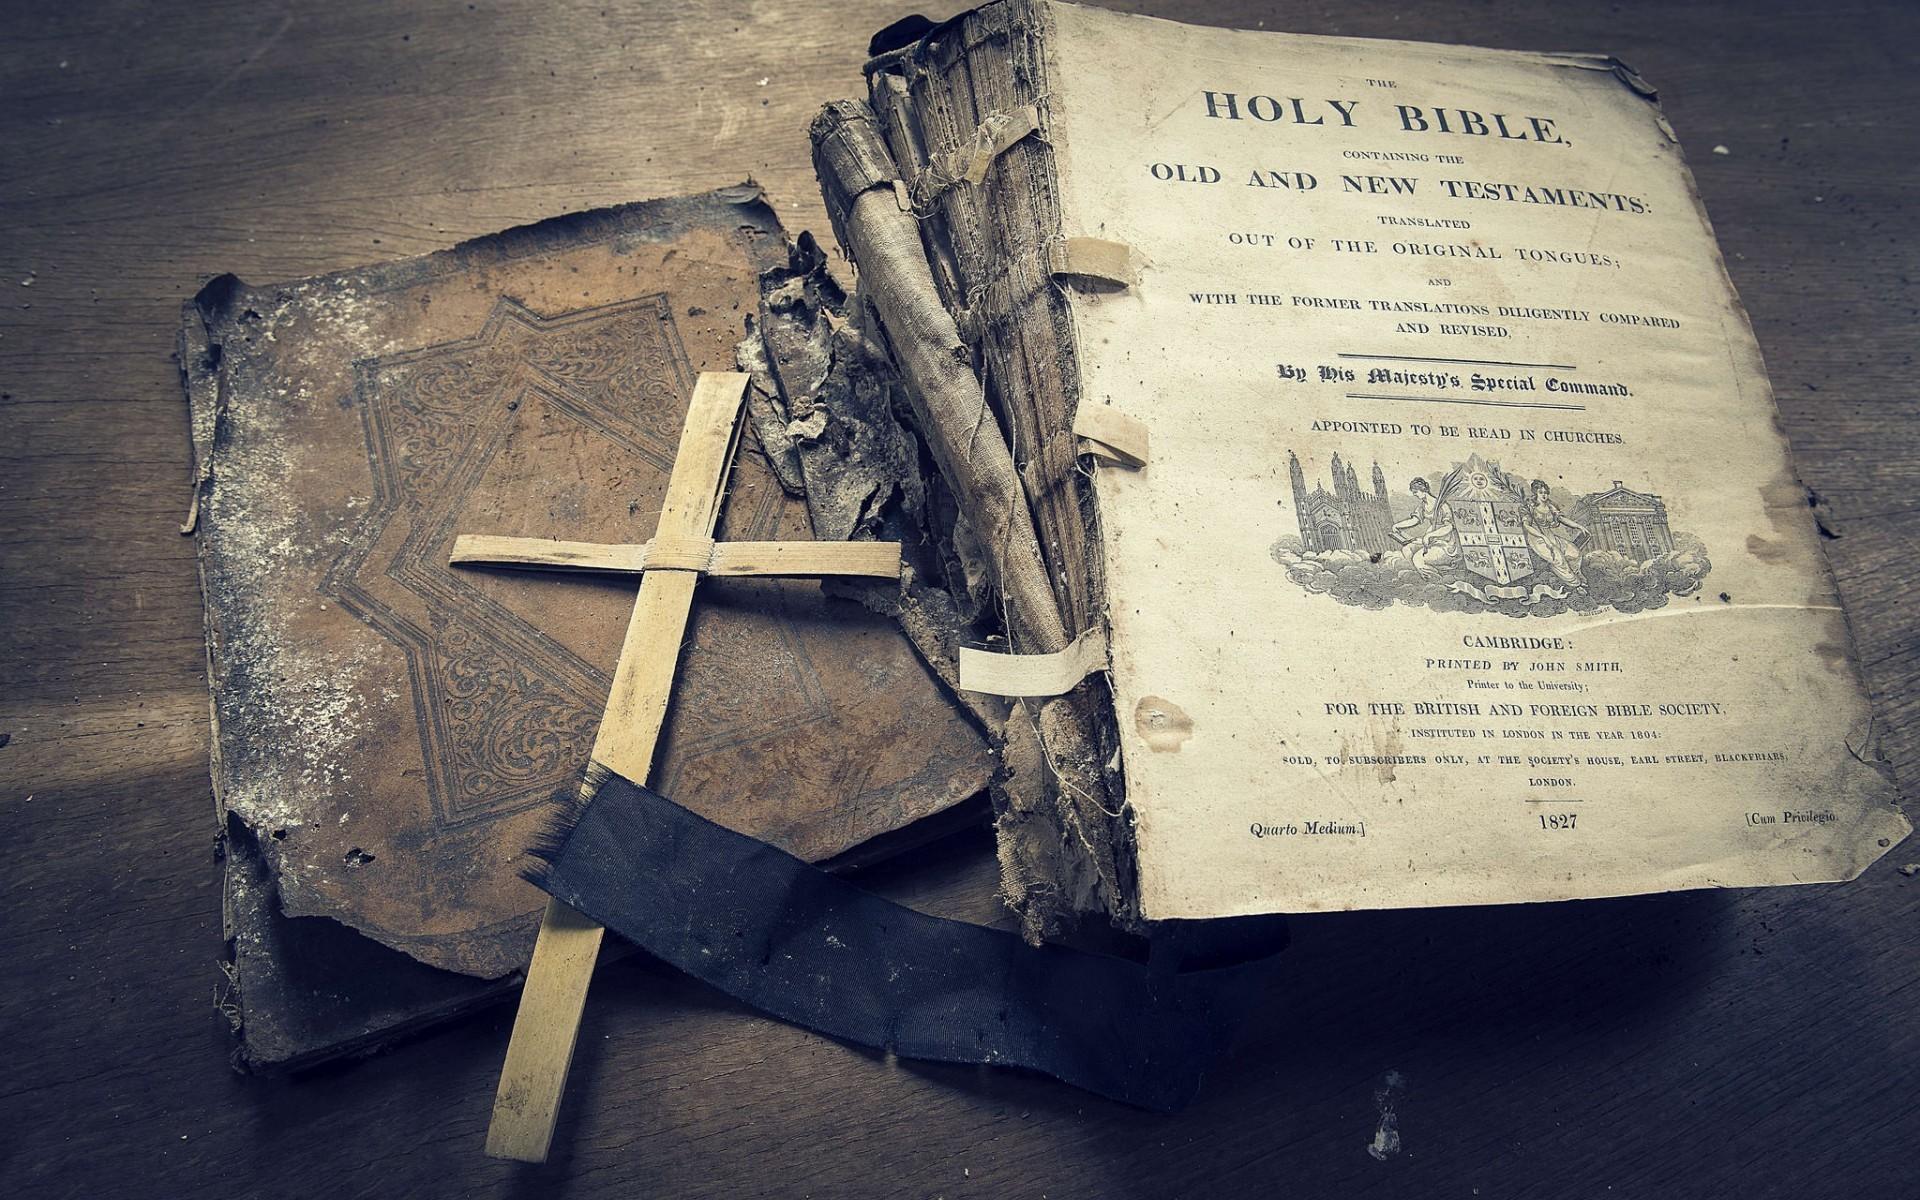 Holy bible wallpaper wallpapertag - Full hd bible wallpapers ...